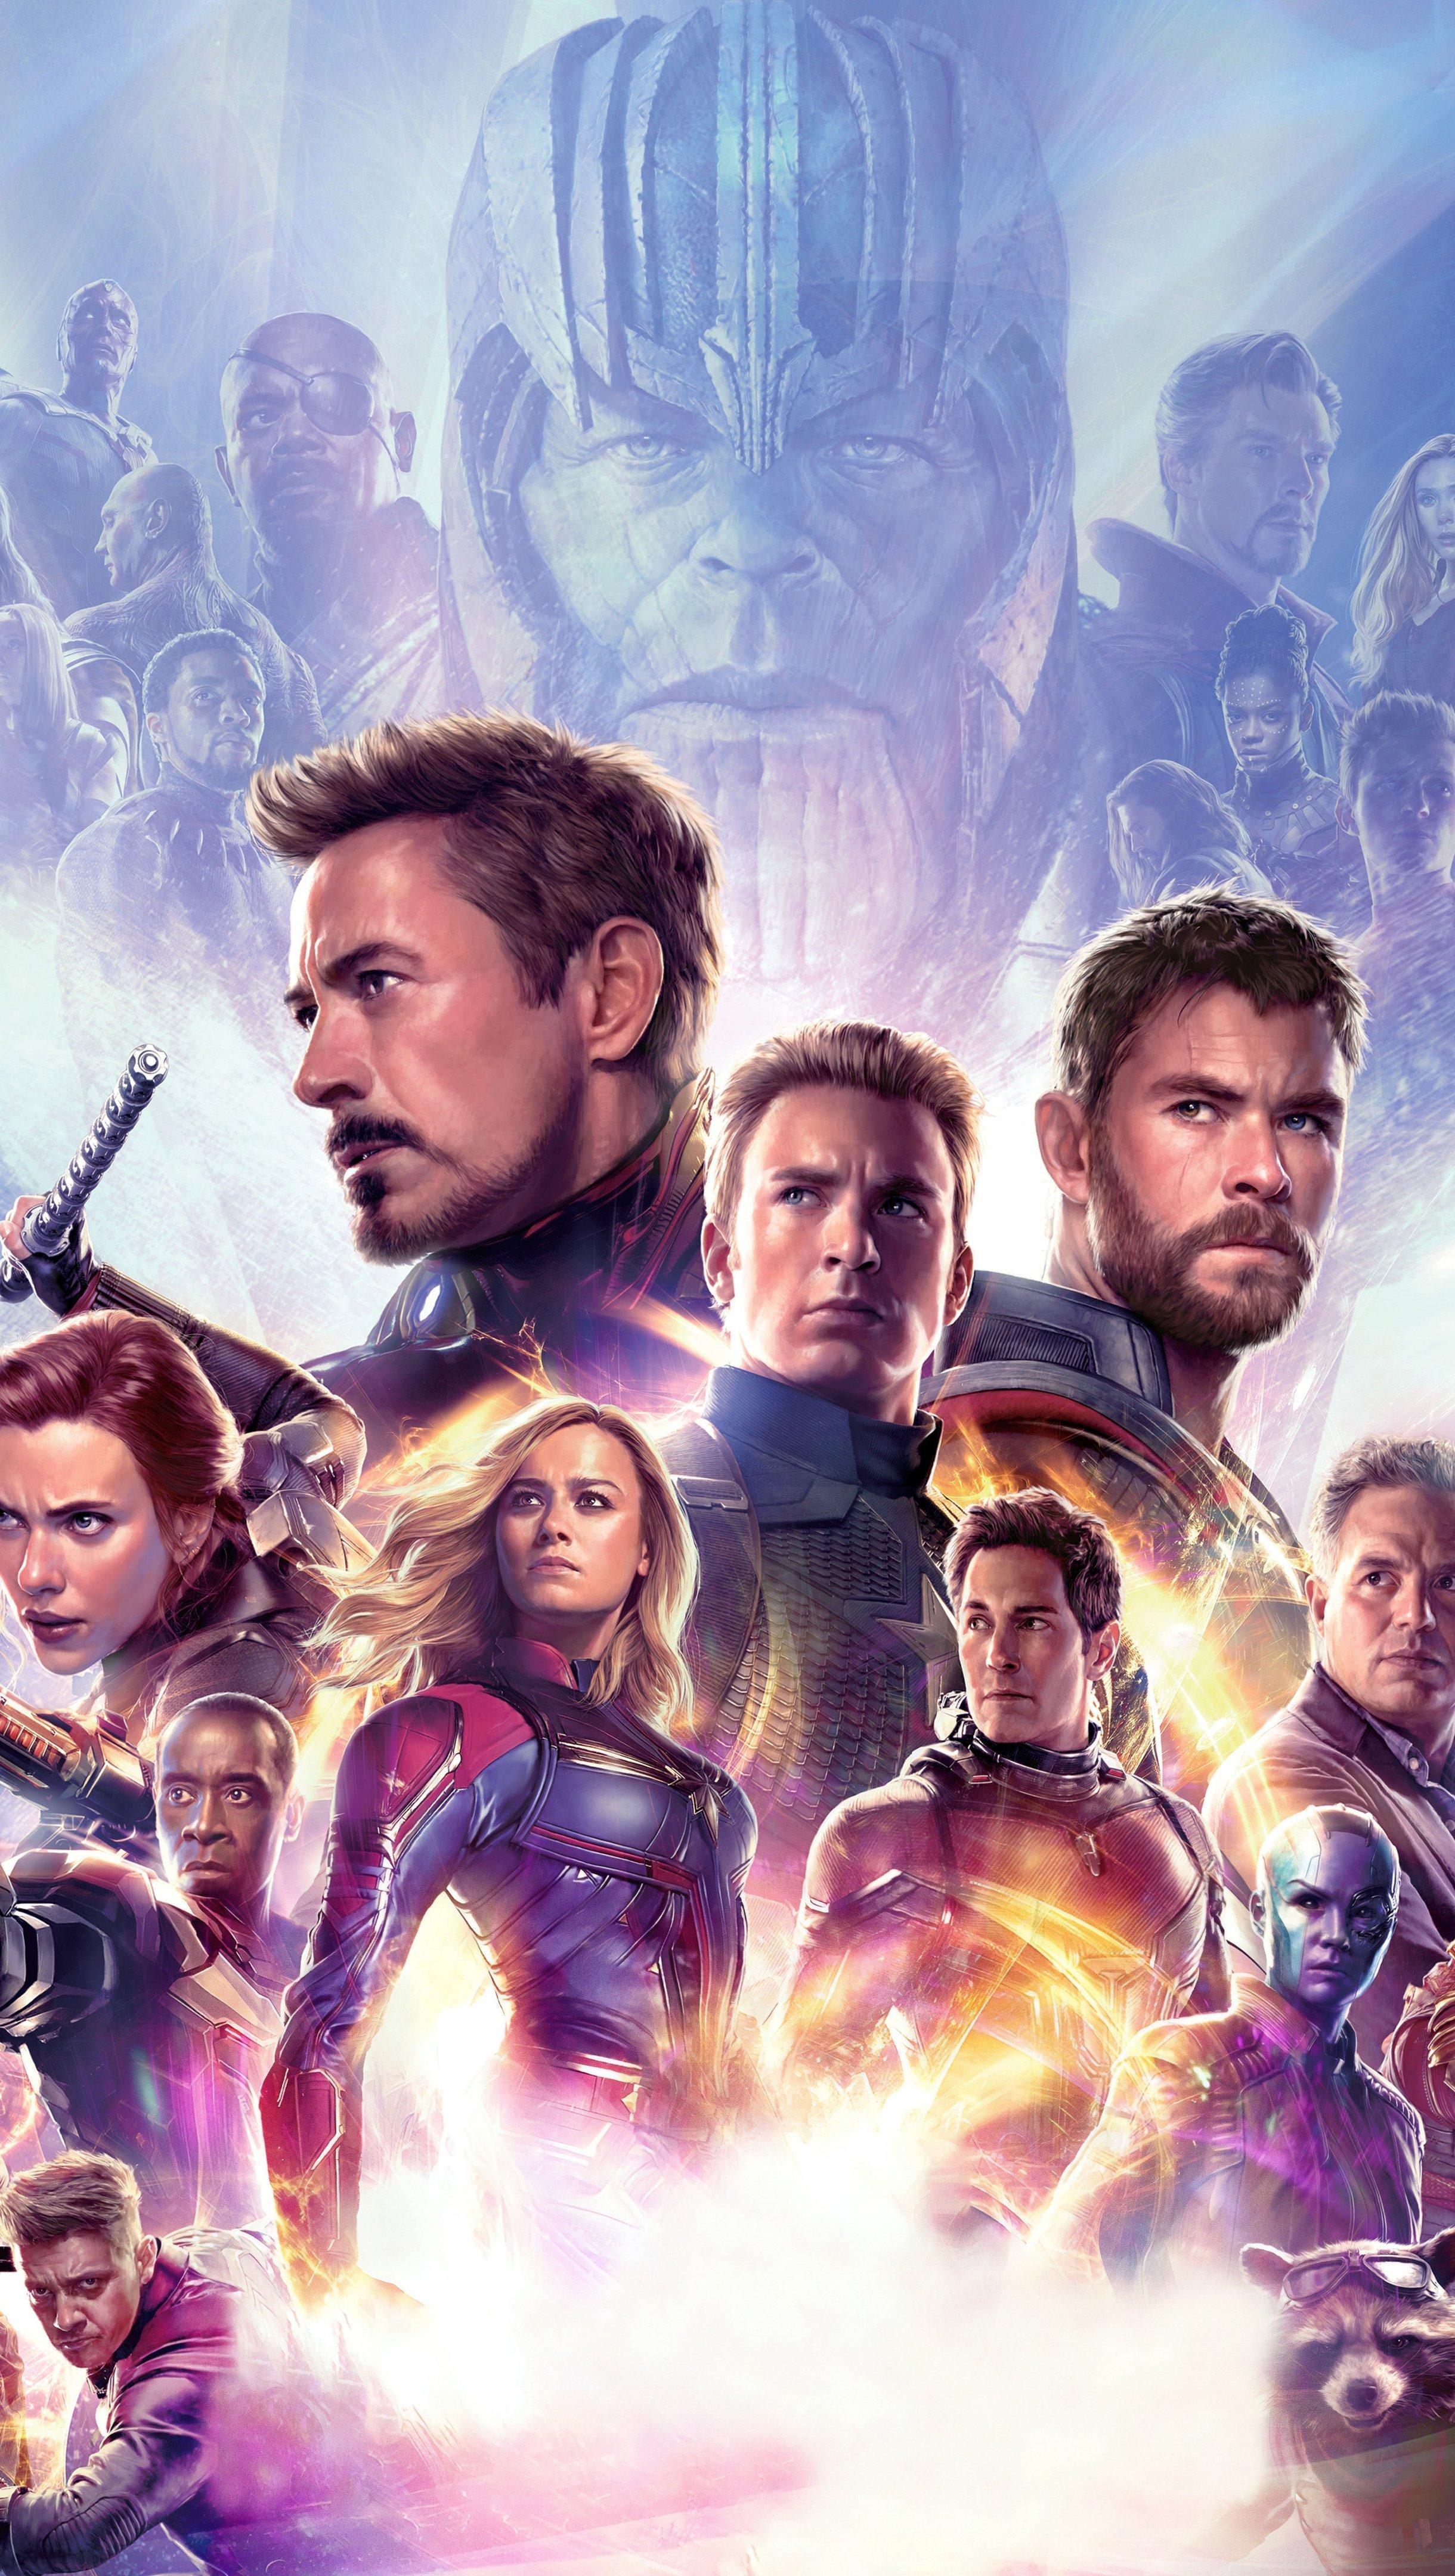 Fondos de pantalla Avengers Endgame Vertical